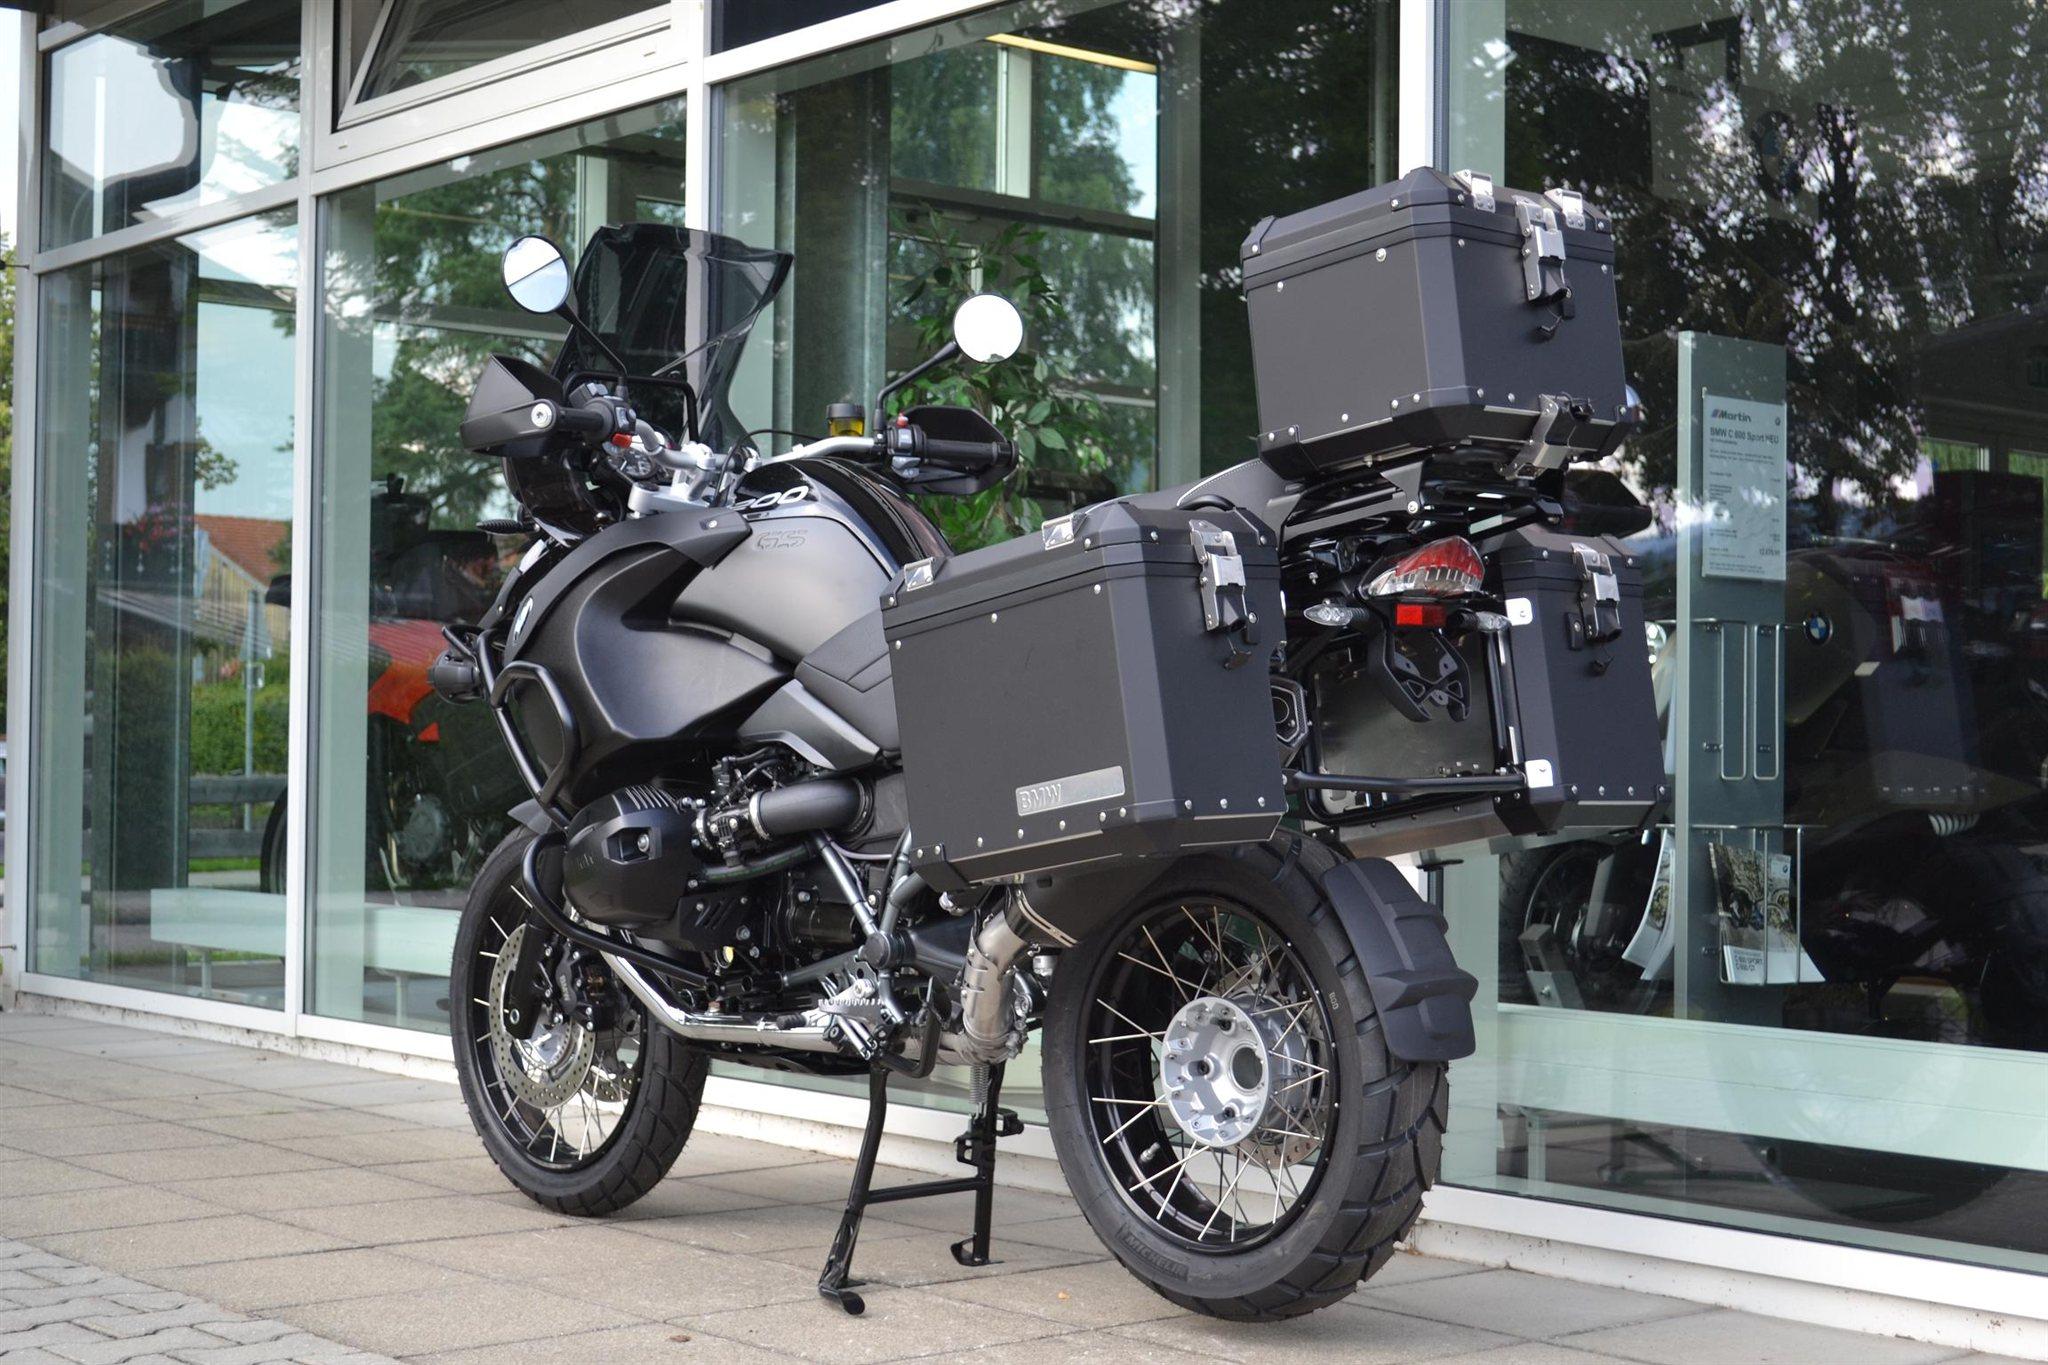 umgebautes motorrad bmw r 1200 gs adventure von erwin. Black Bedroom Furniture Sets. Home Design Ideas